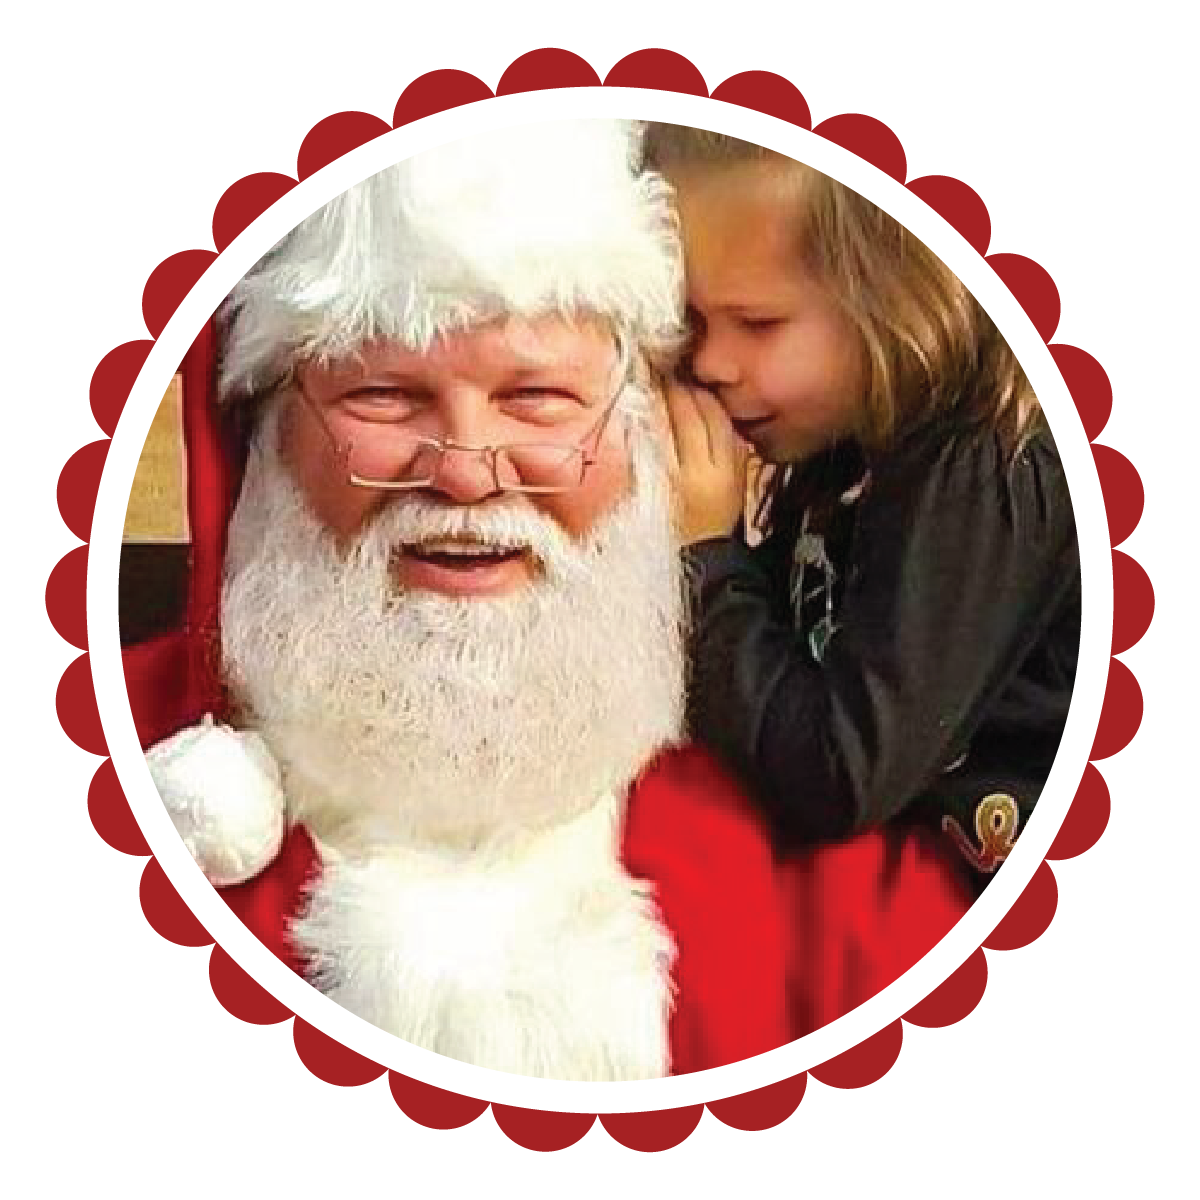 Santa_Image-01.png